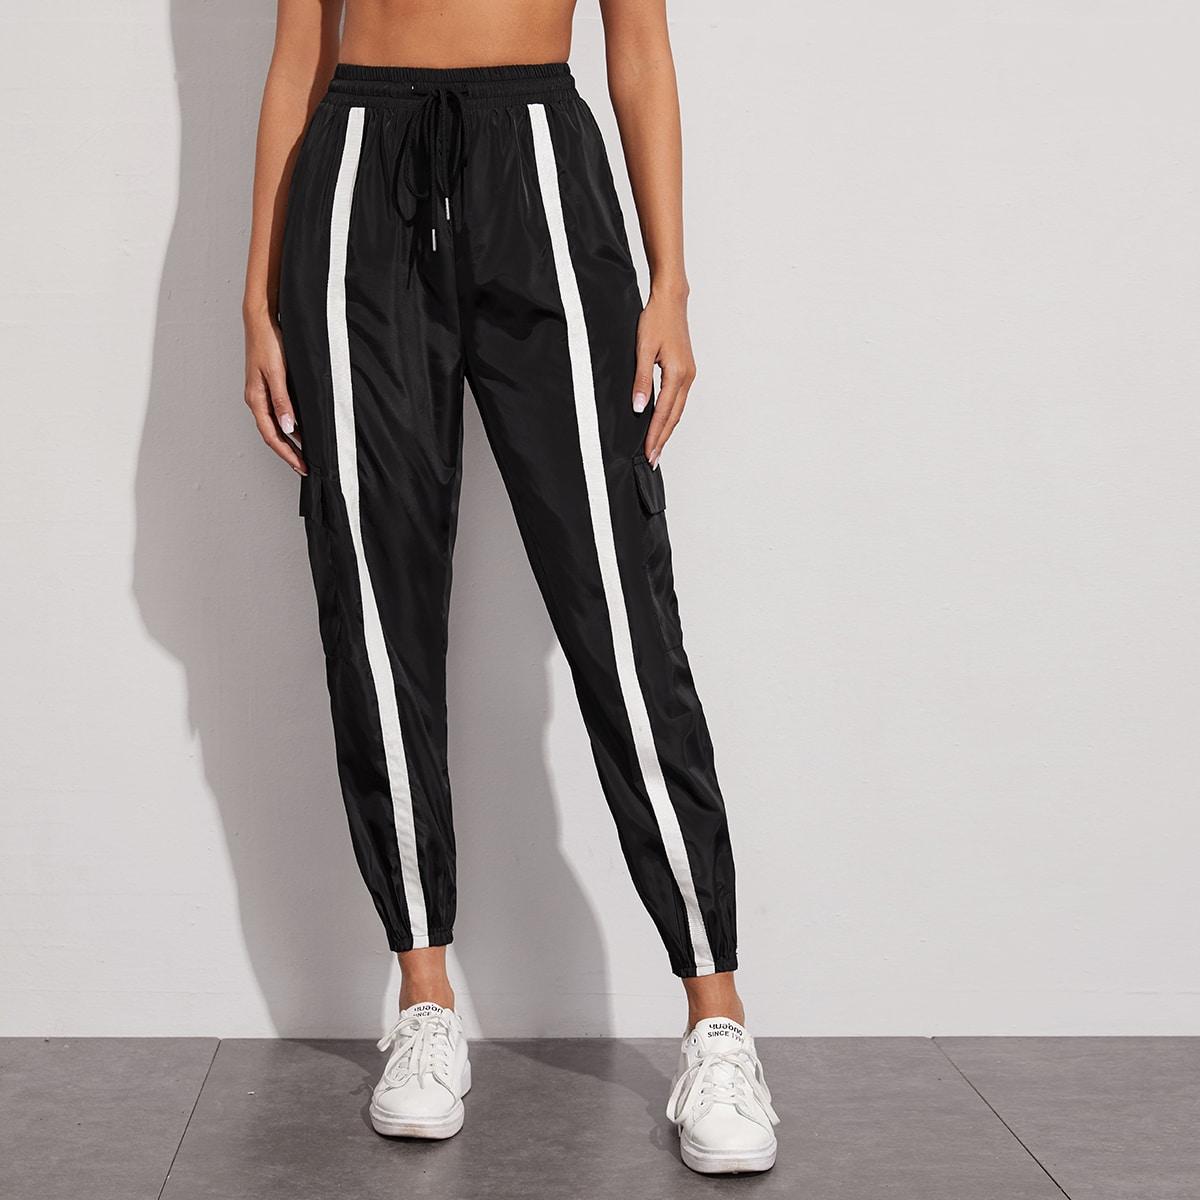 SHEIN / Pantalones cargo panel en contraste de cintura con cordón